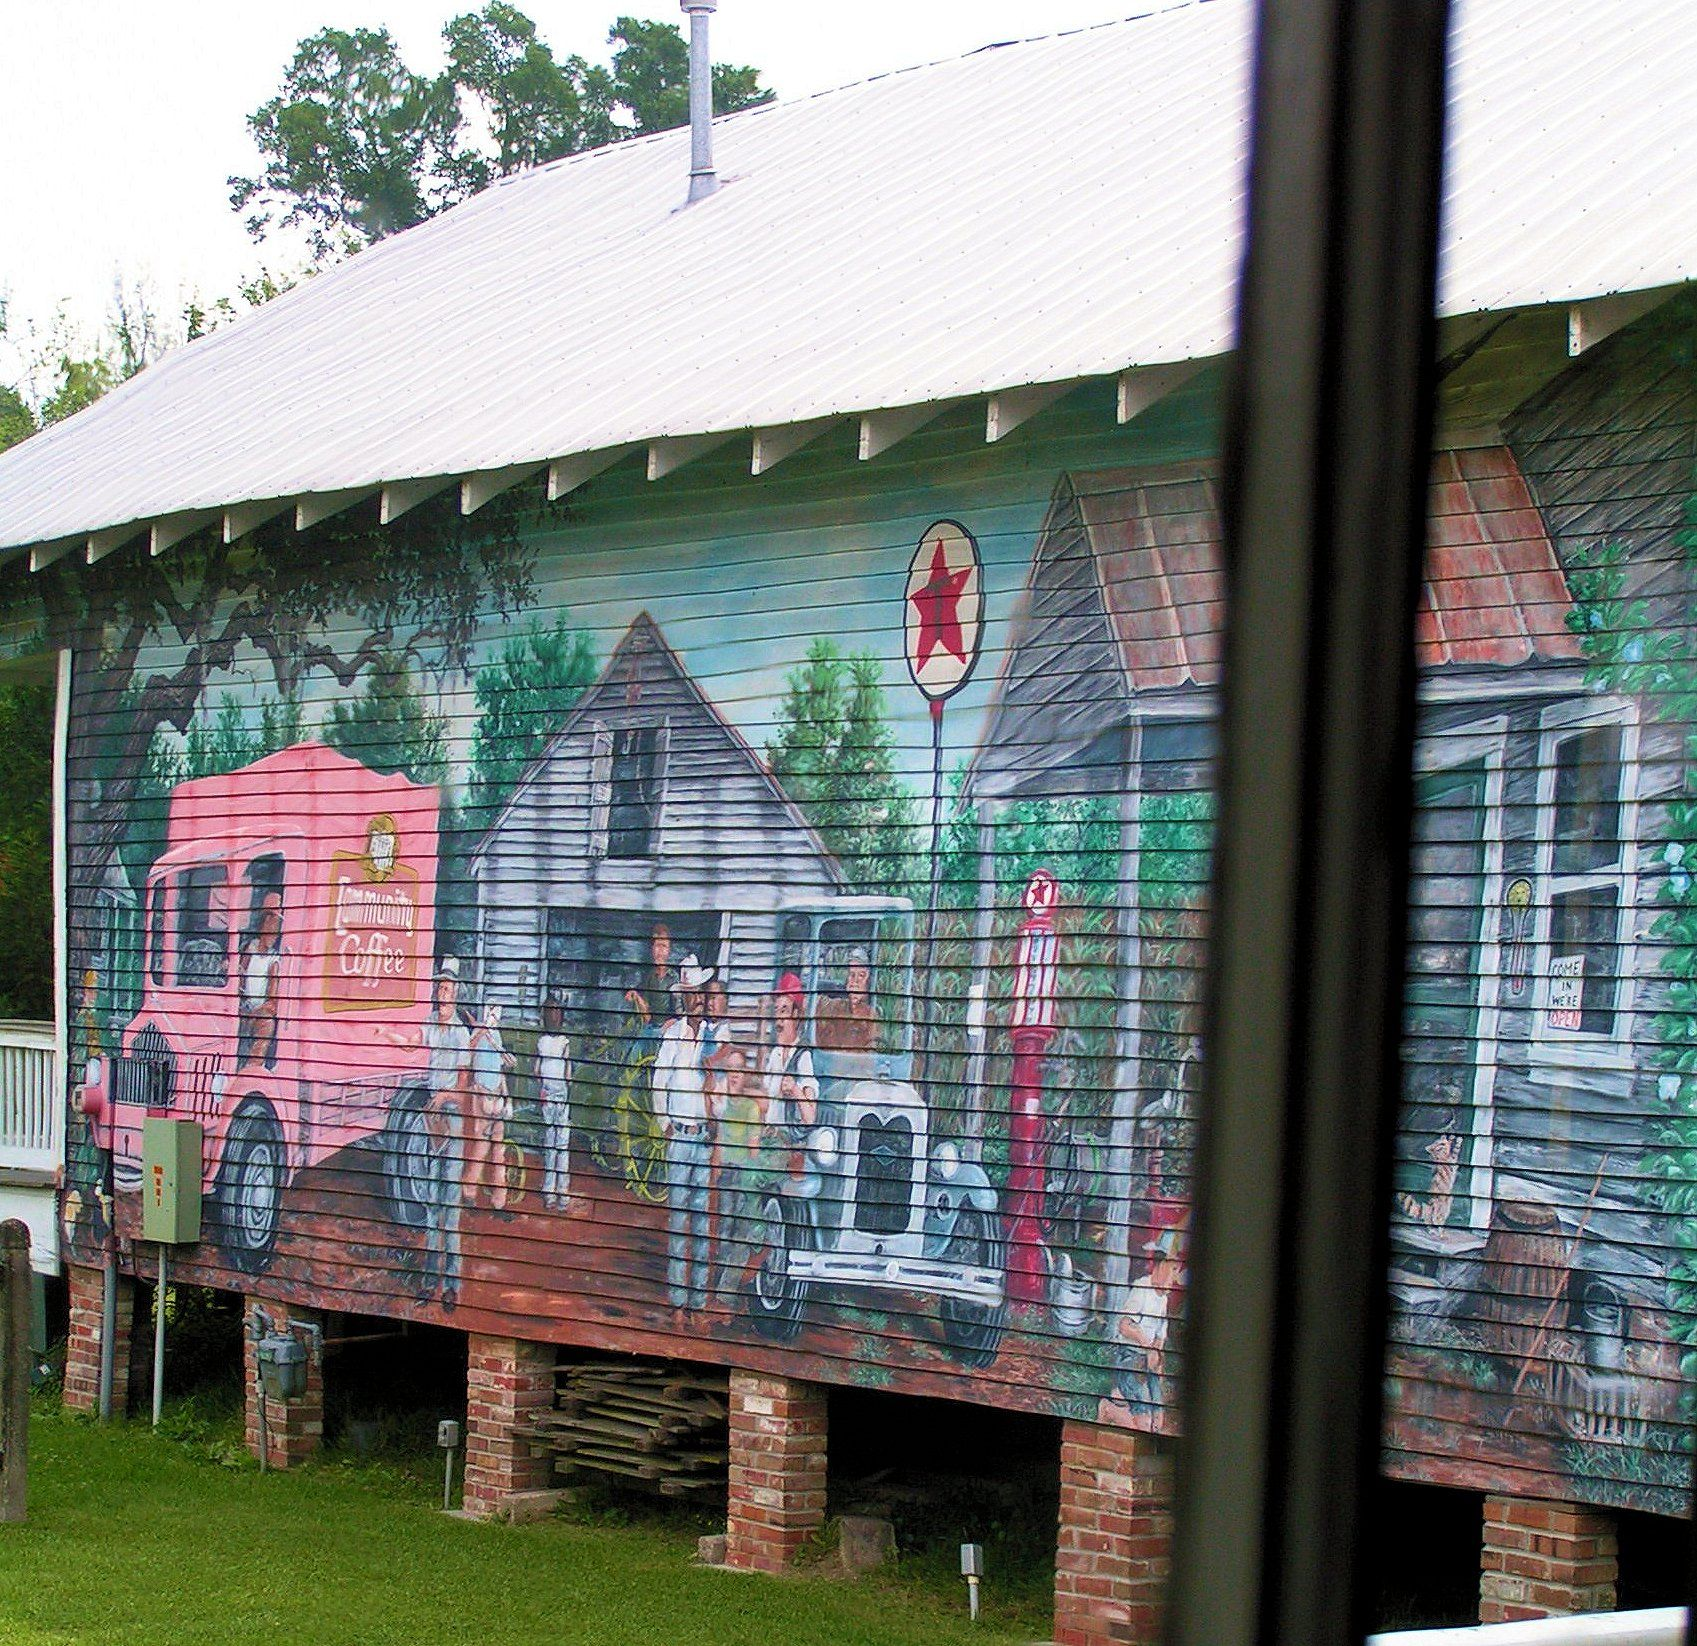 Louisiana mural at the cajun village near sorrento